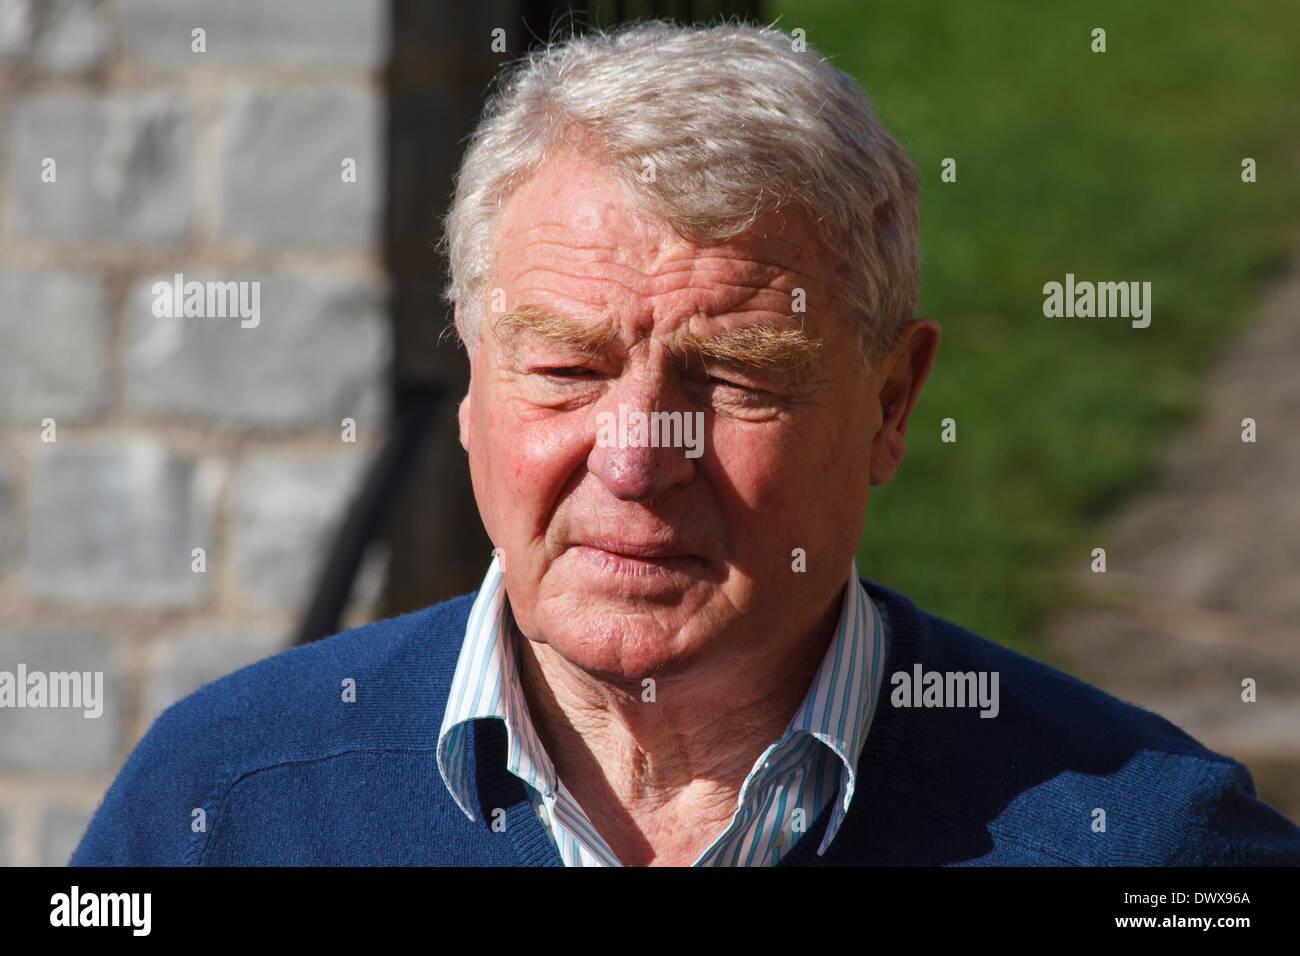 Lord Paddy Ashdown, Baron Ashdown of Norton-sub-Hamdon, British politician, former leader of the Liberal Democratic Party - Stock Image